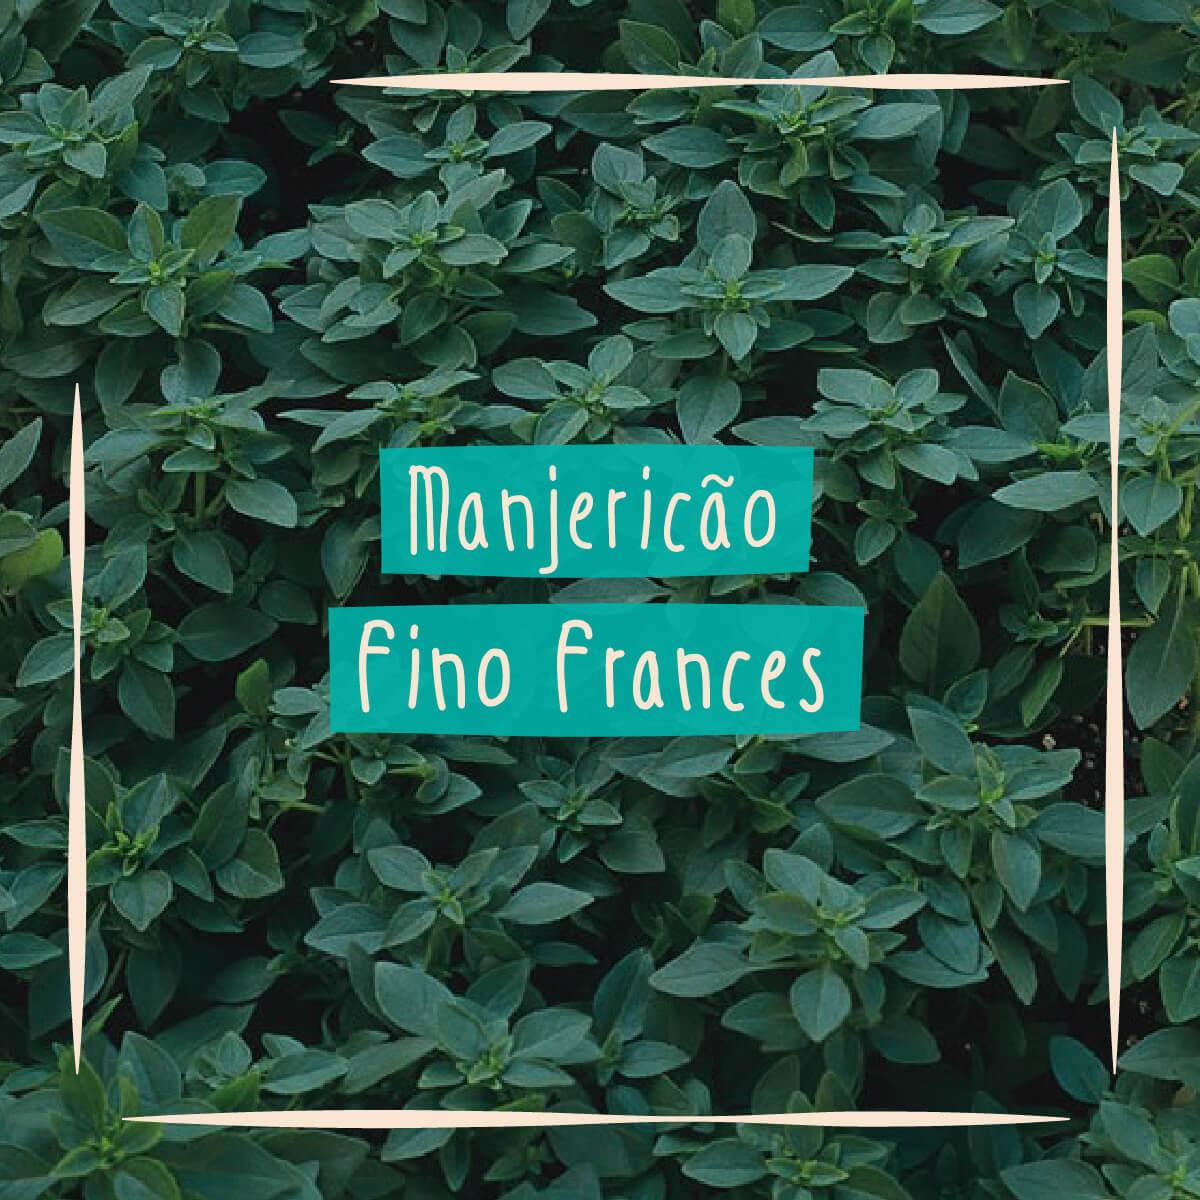 Sementes para plantar Manjericão Fino Francês em vasos autoirrigáveis RAIZ  - Loja Raiz